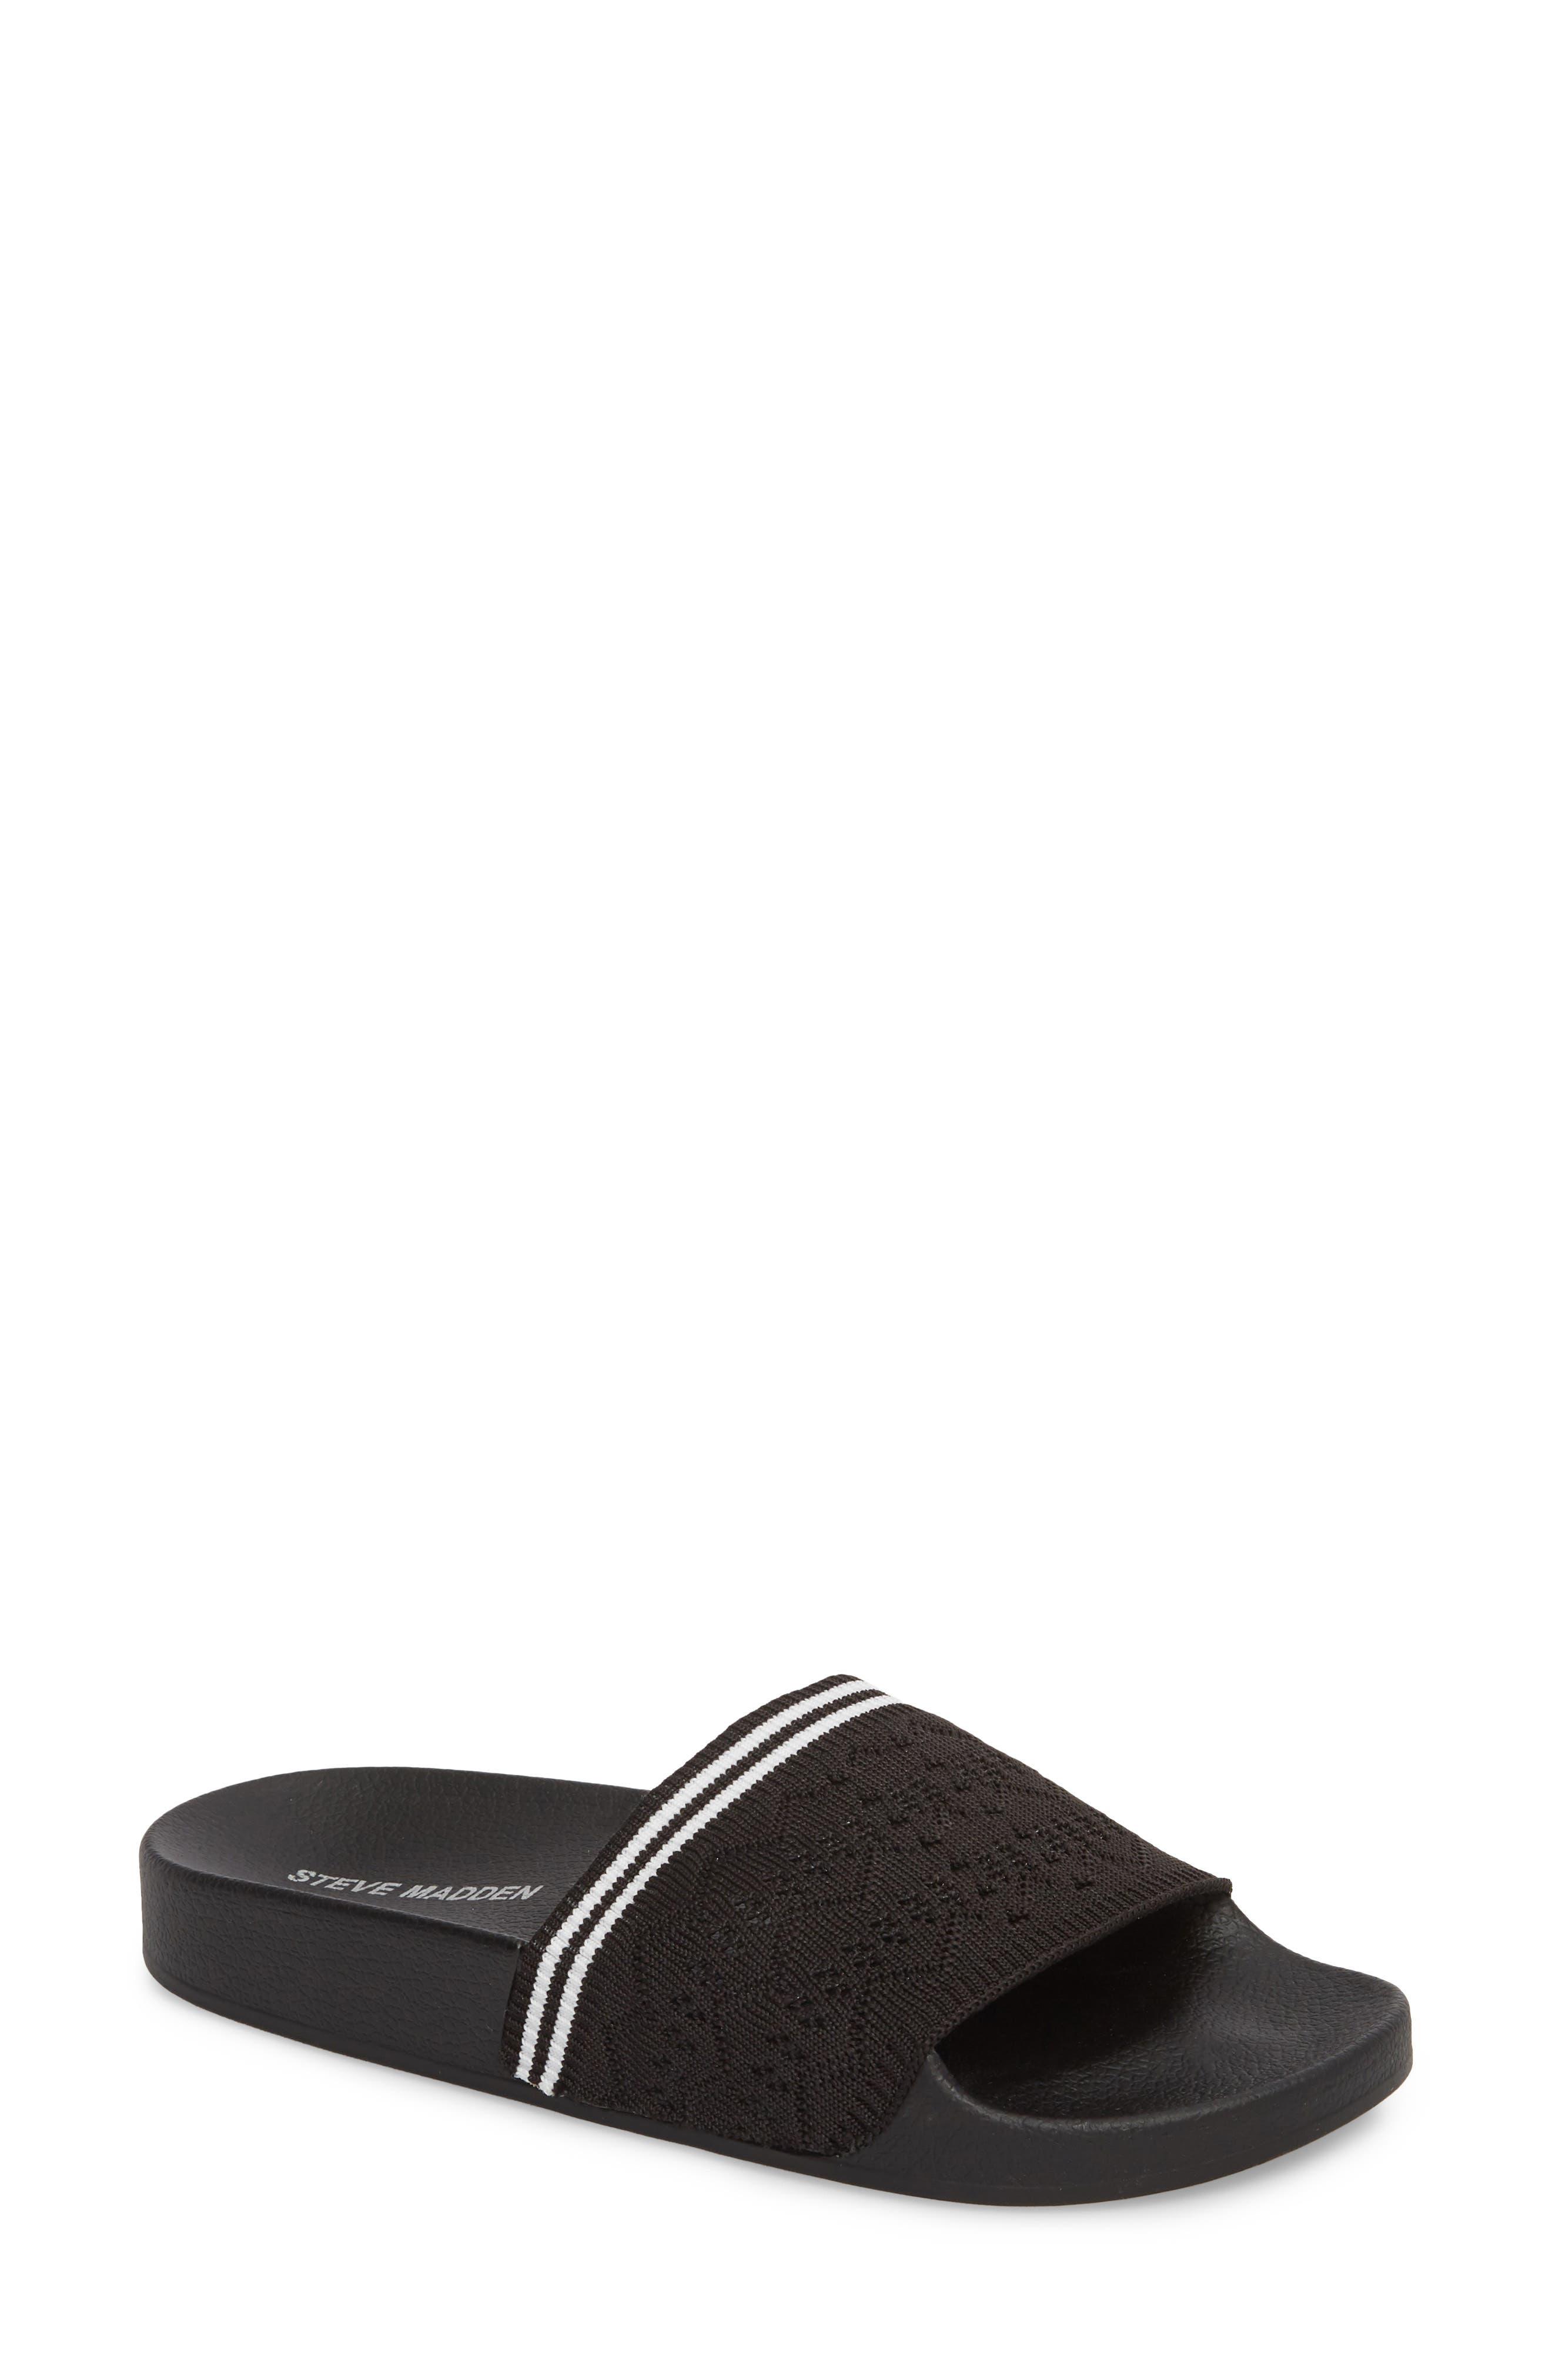 Vibe Sock Knit Slide Sandal,                         Main,                         color, 001